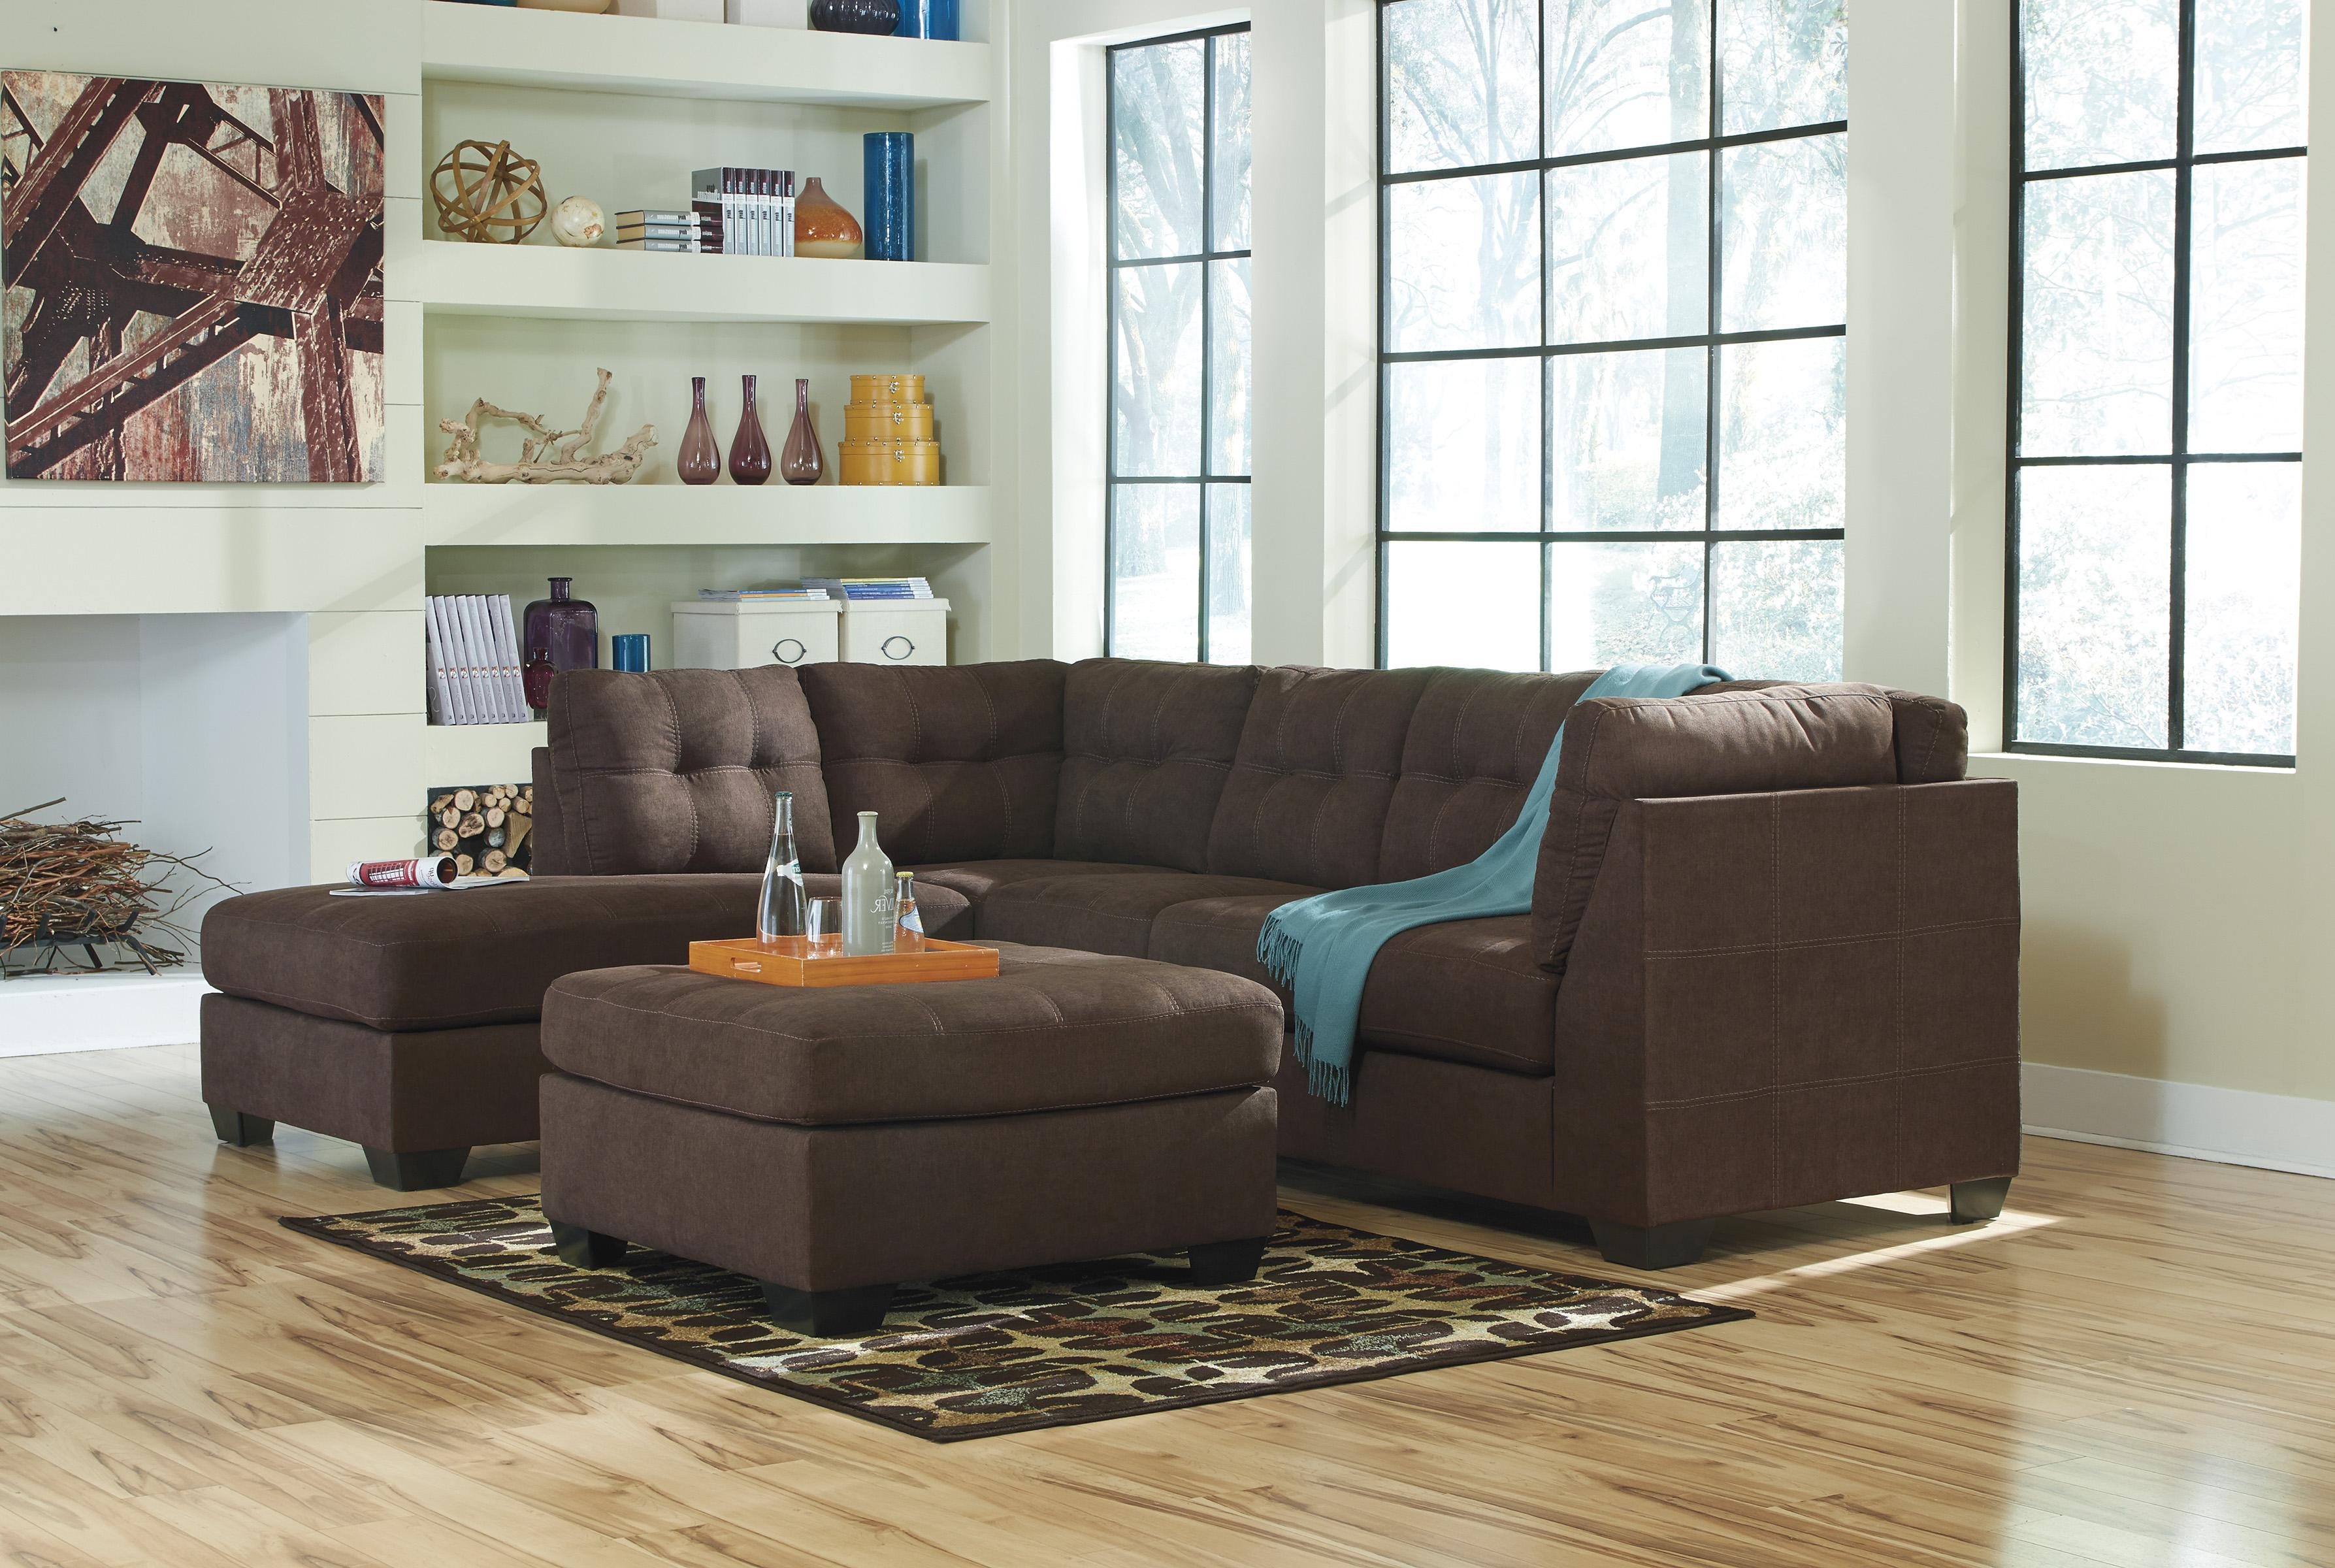 benchcraft by ashley maier walnut stationary living room. Black Bedroom Furniture Sets. Home Design Ideas